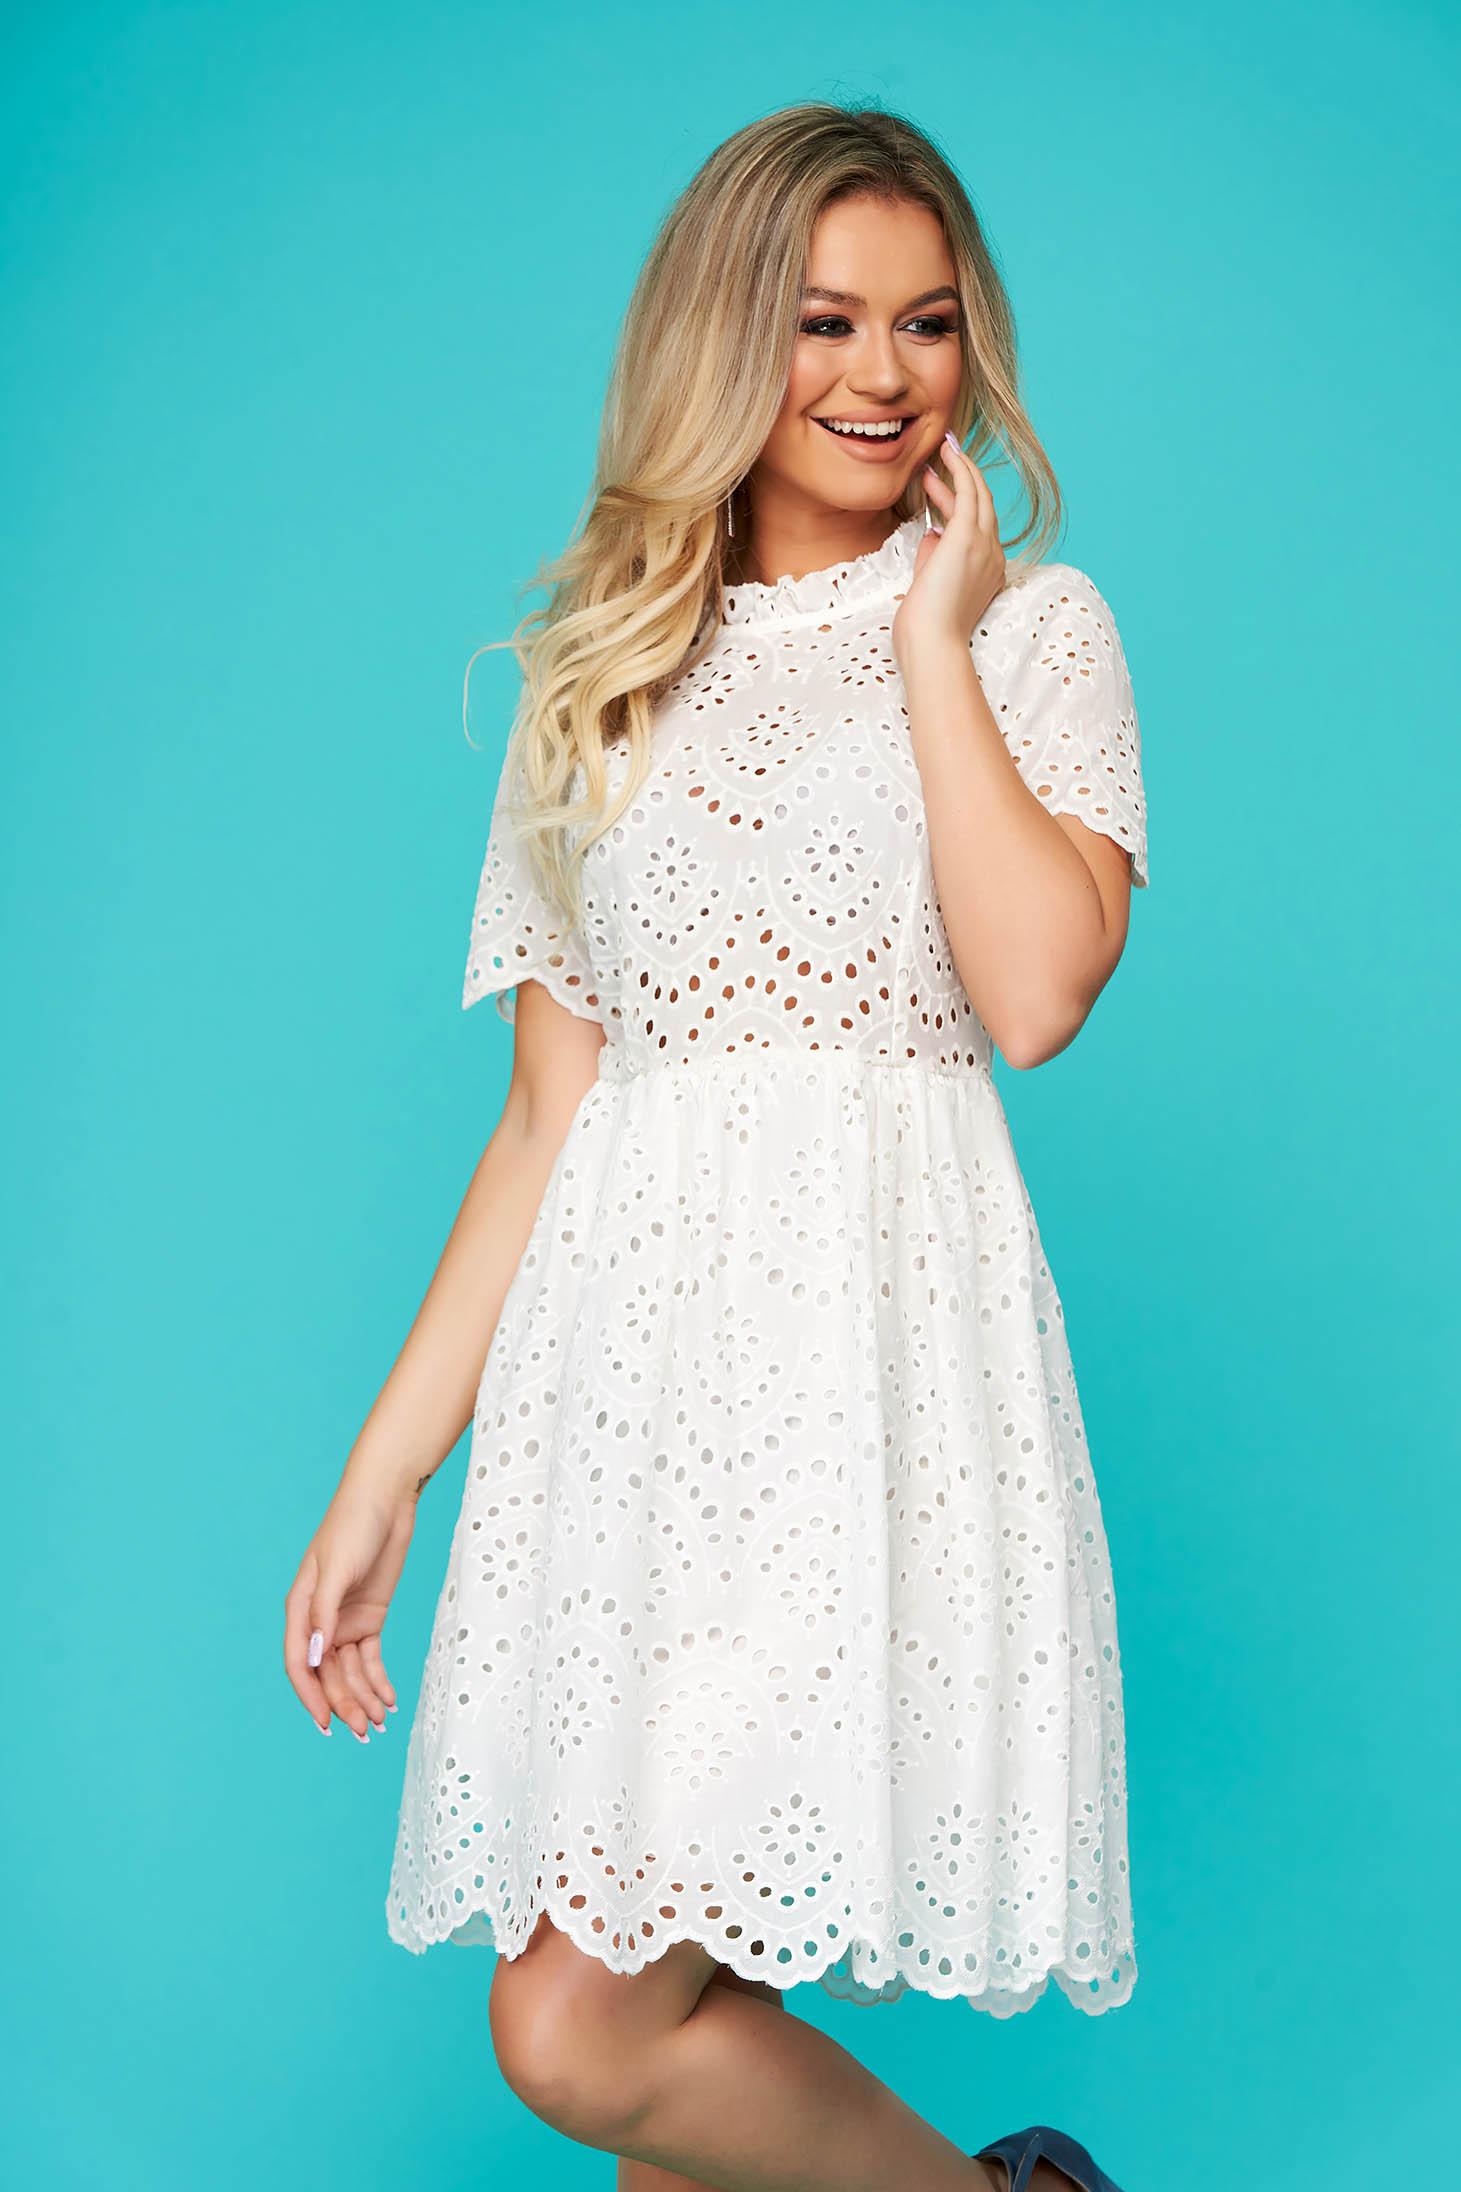 White dress short cut daily guipure cloche short sleeves